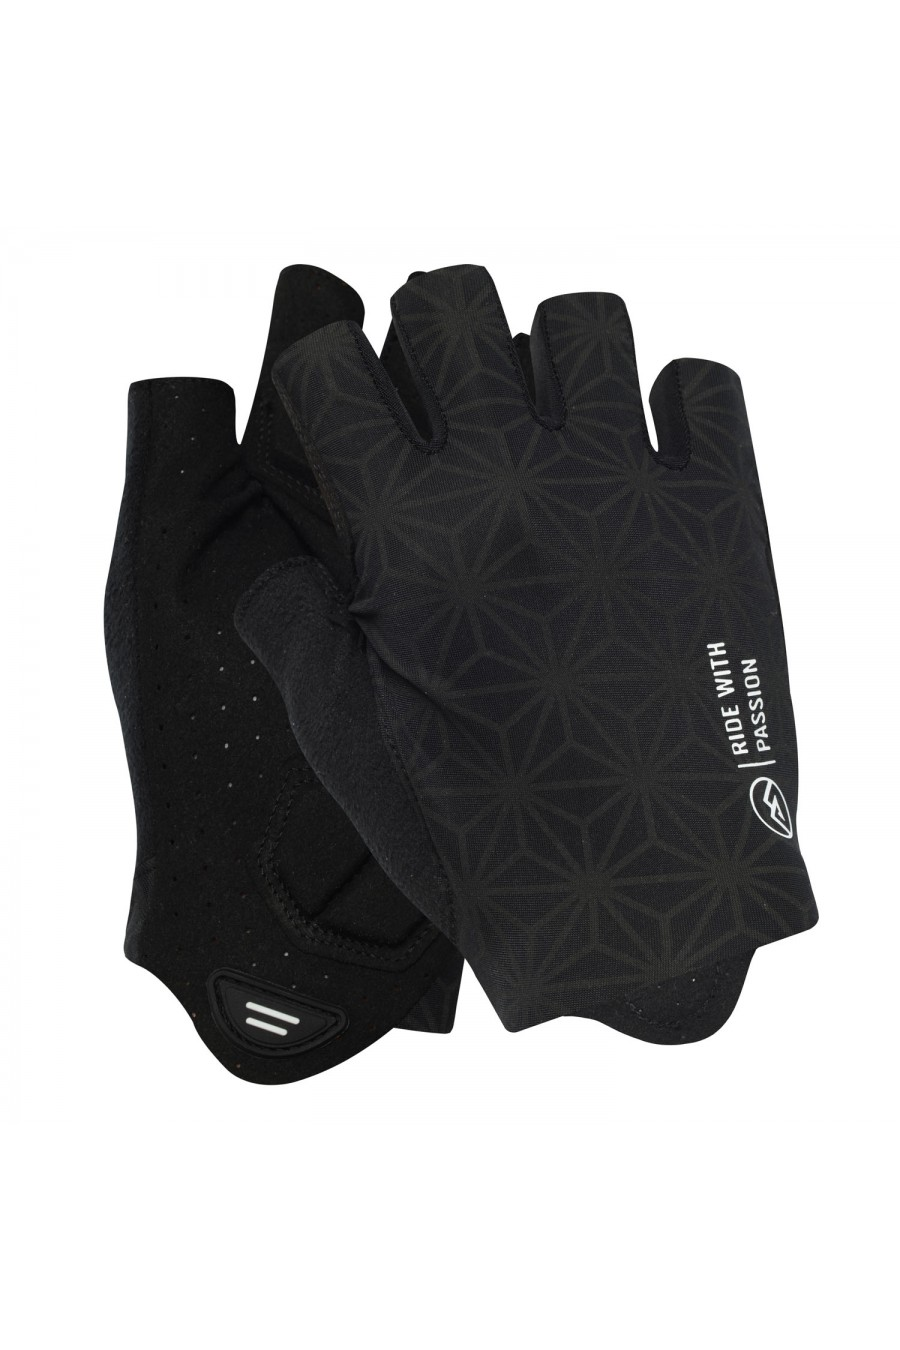 custom cycling Gloves low minimum